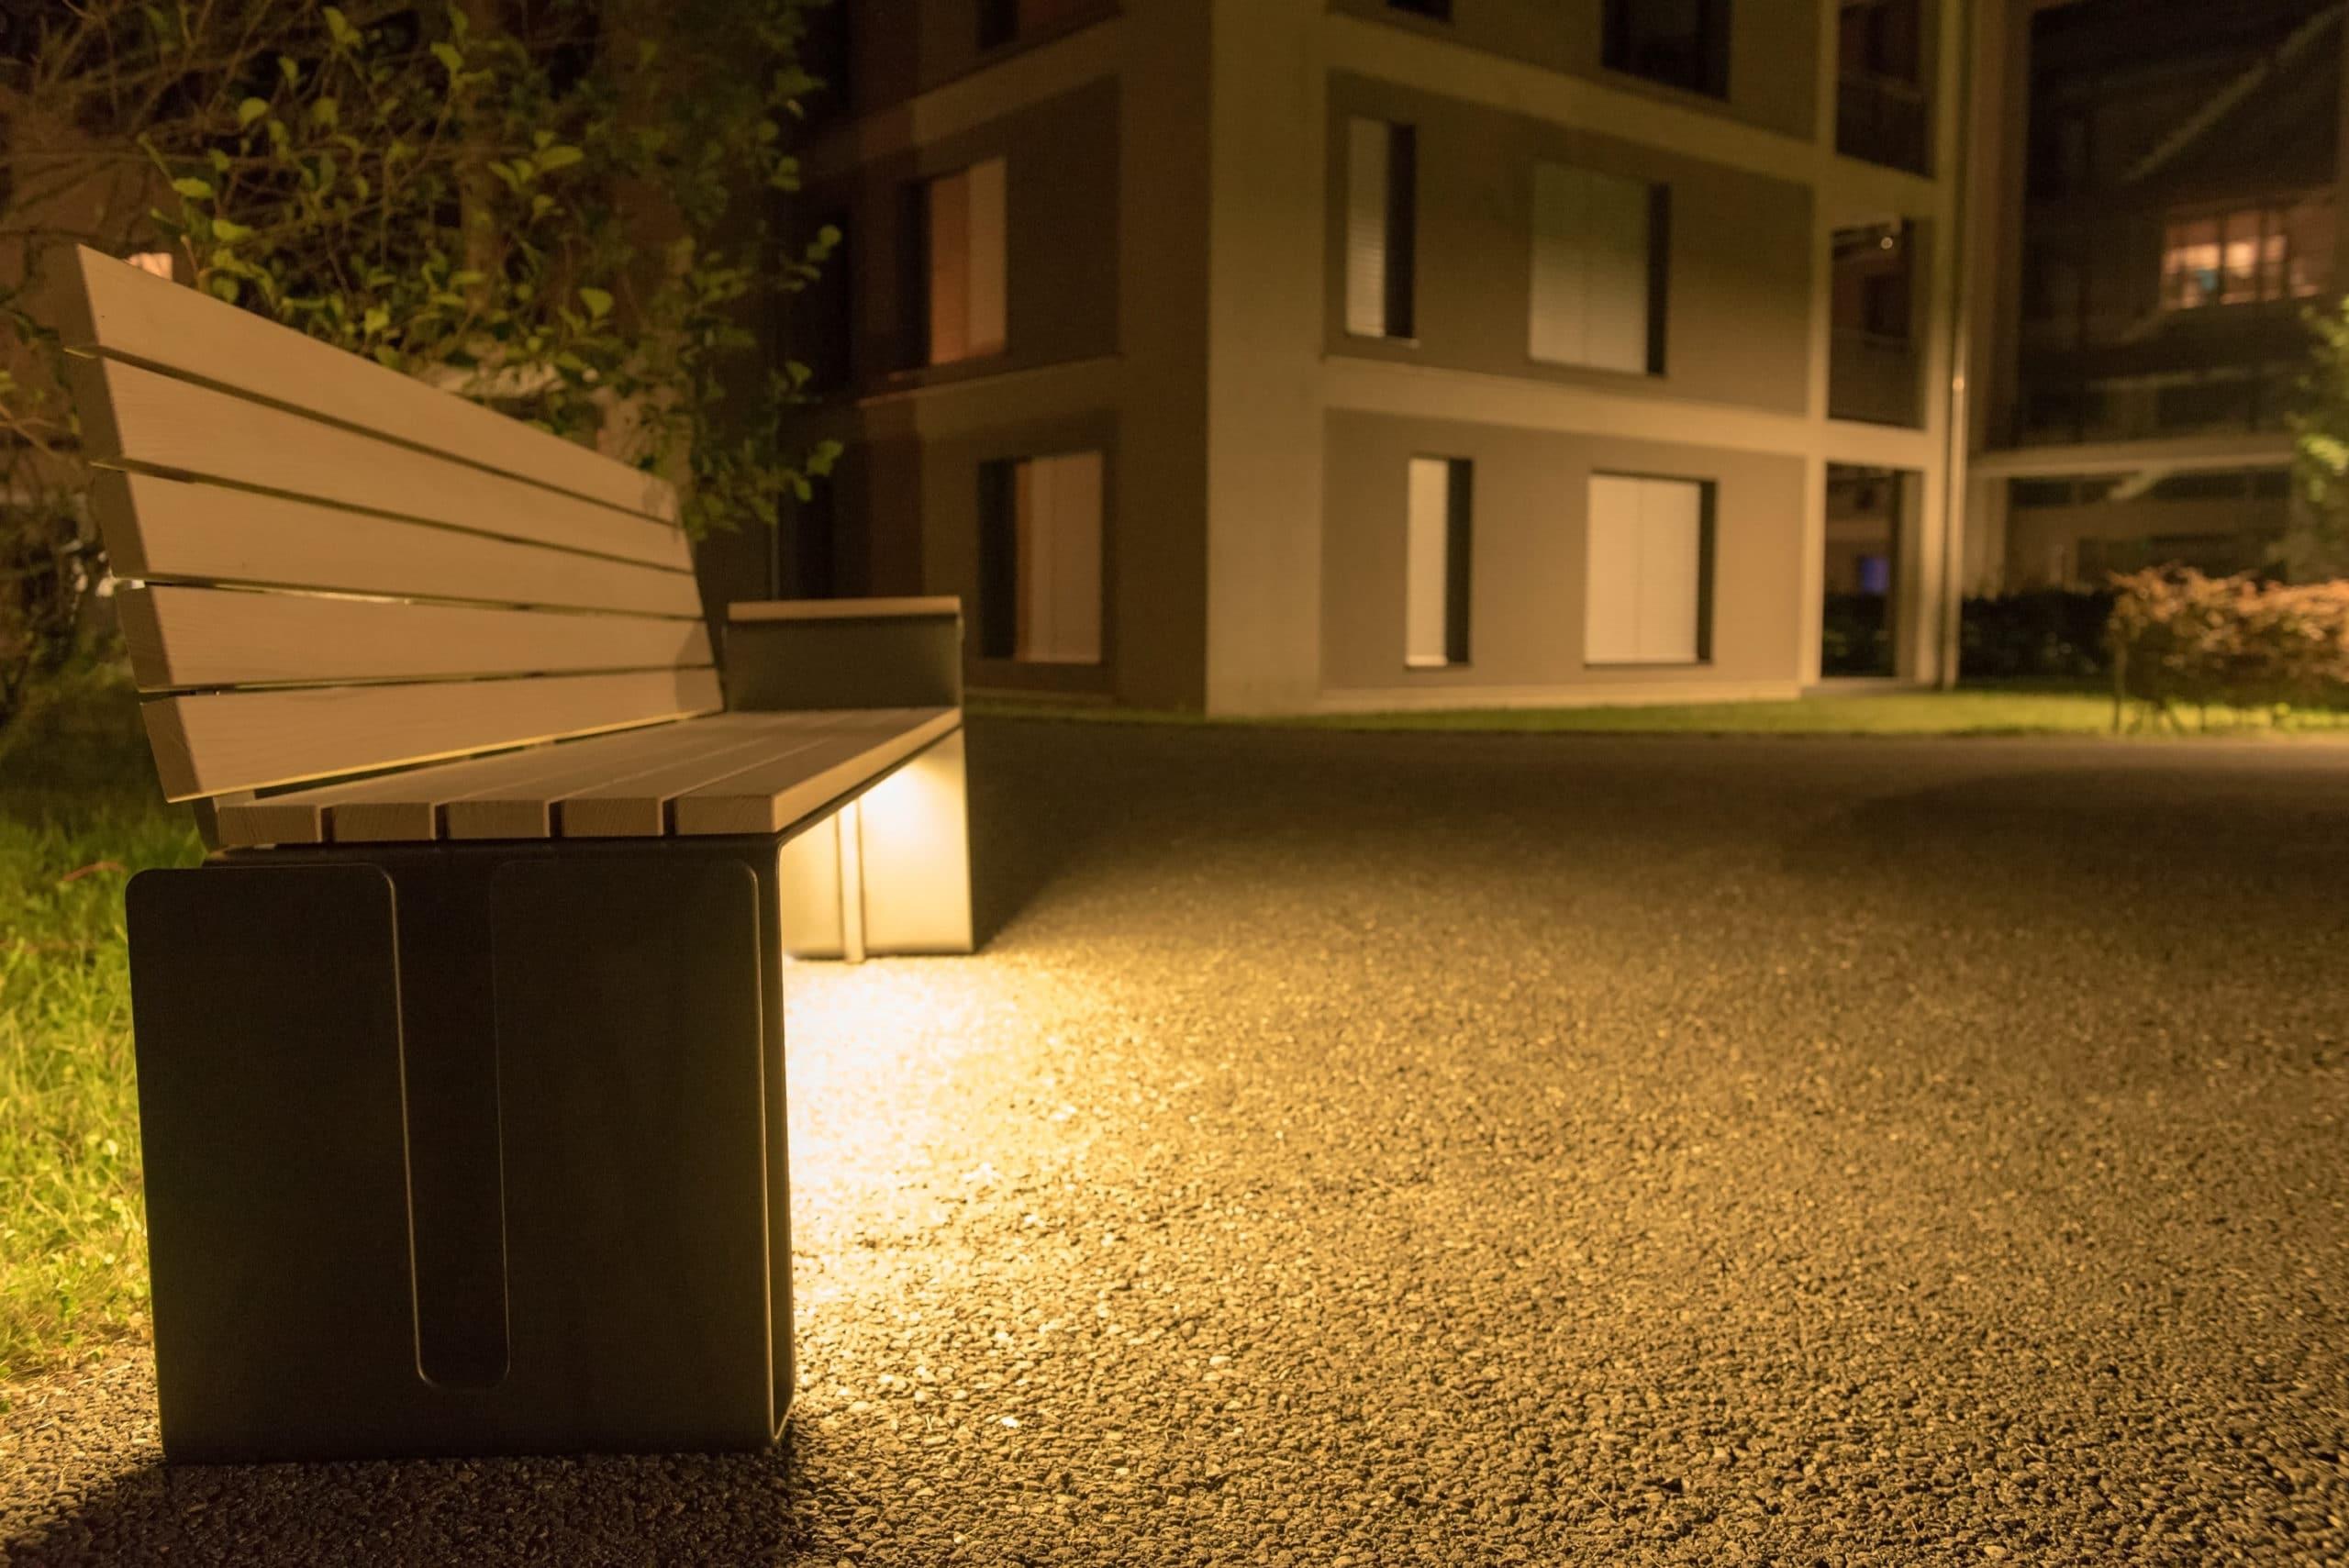 Parkbank Parker, LED Beleuchtung, Stadtmobiliar, Public Furniture, Holzrost, Weisstanne